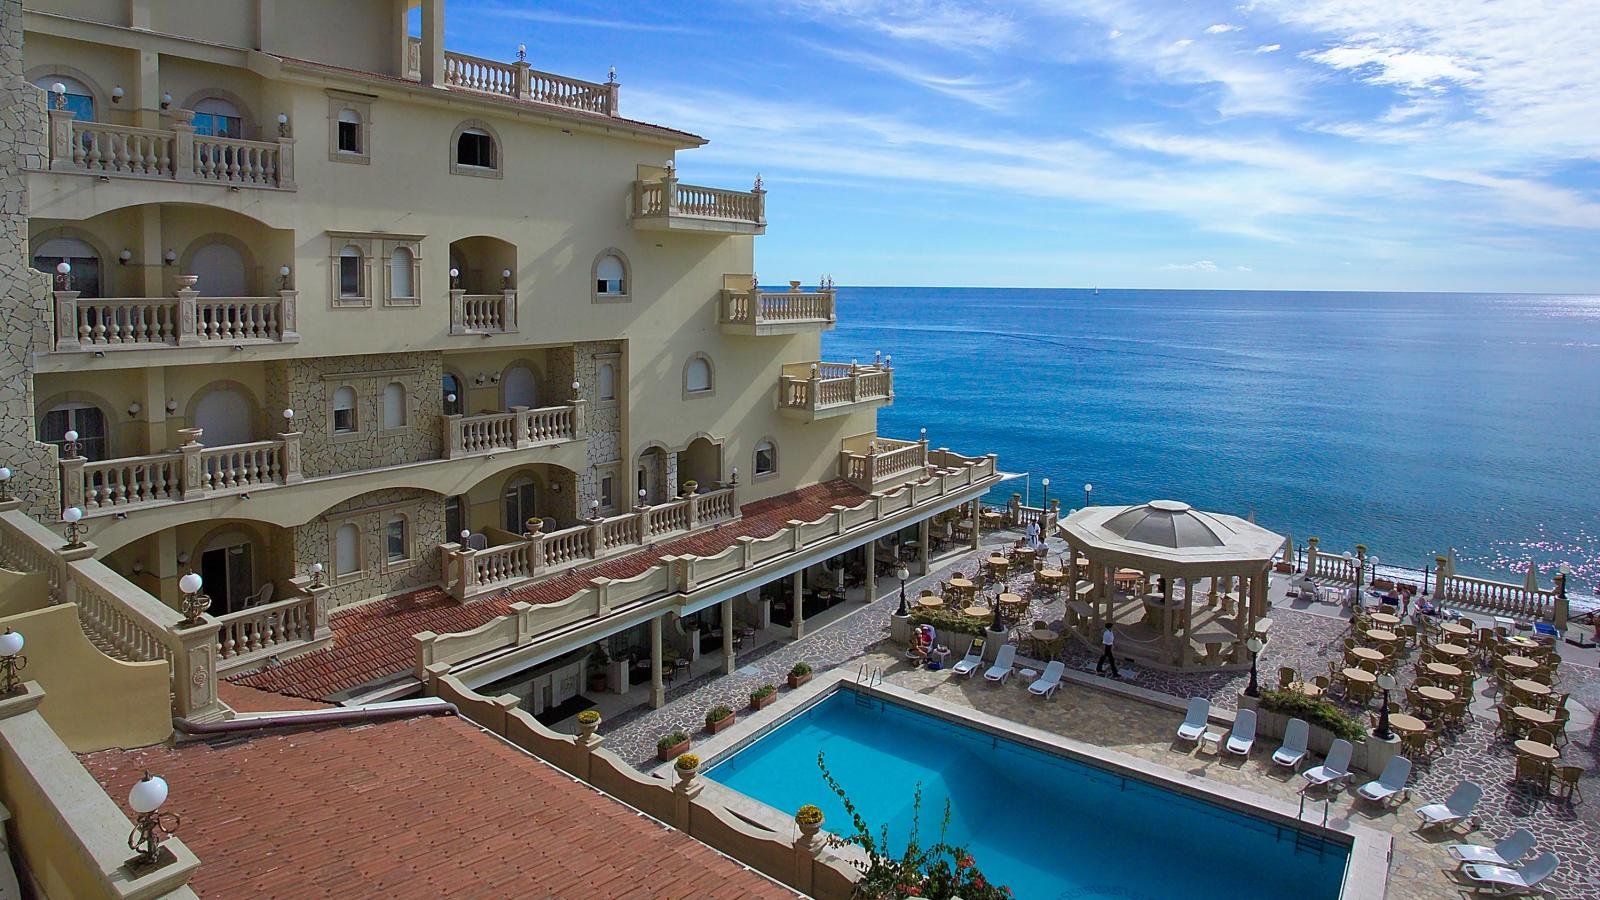 4 hellenia yachting hotel giardini naxos sicily topflight - Hotel ai giardini naxos ...